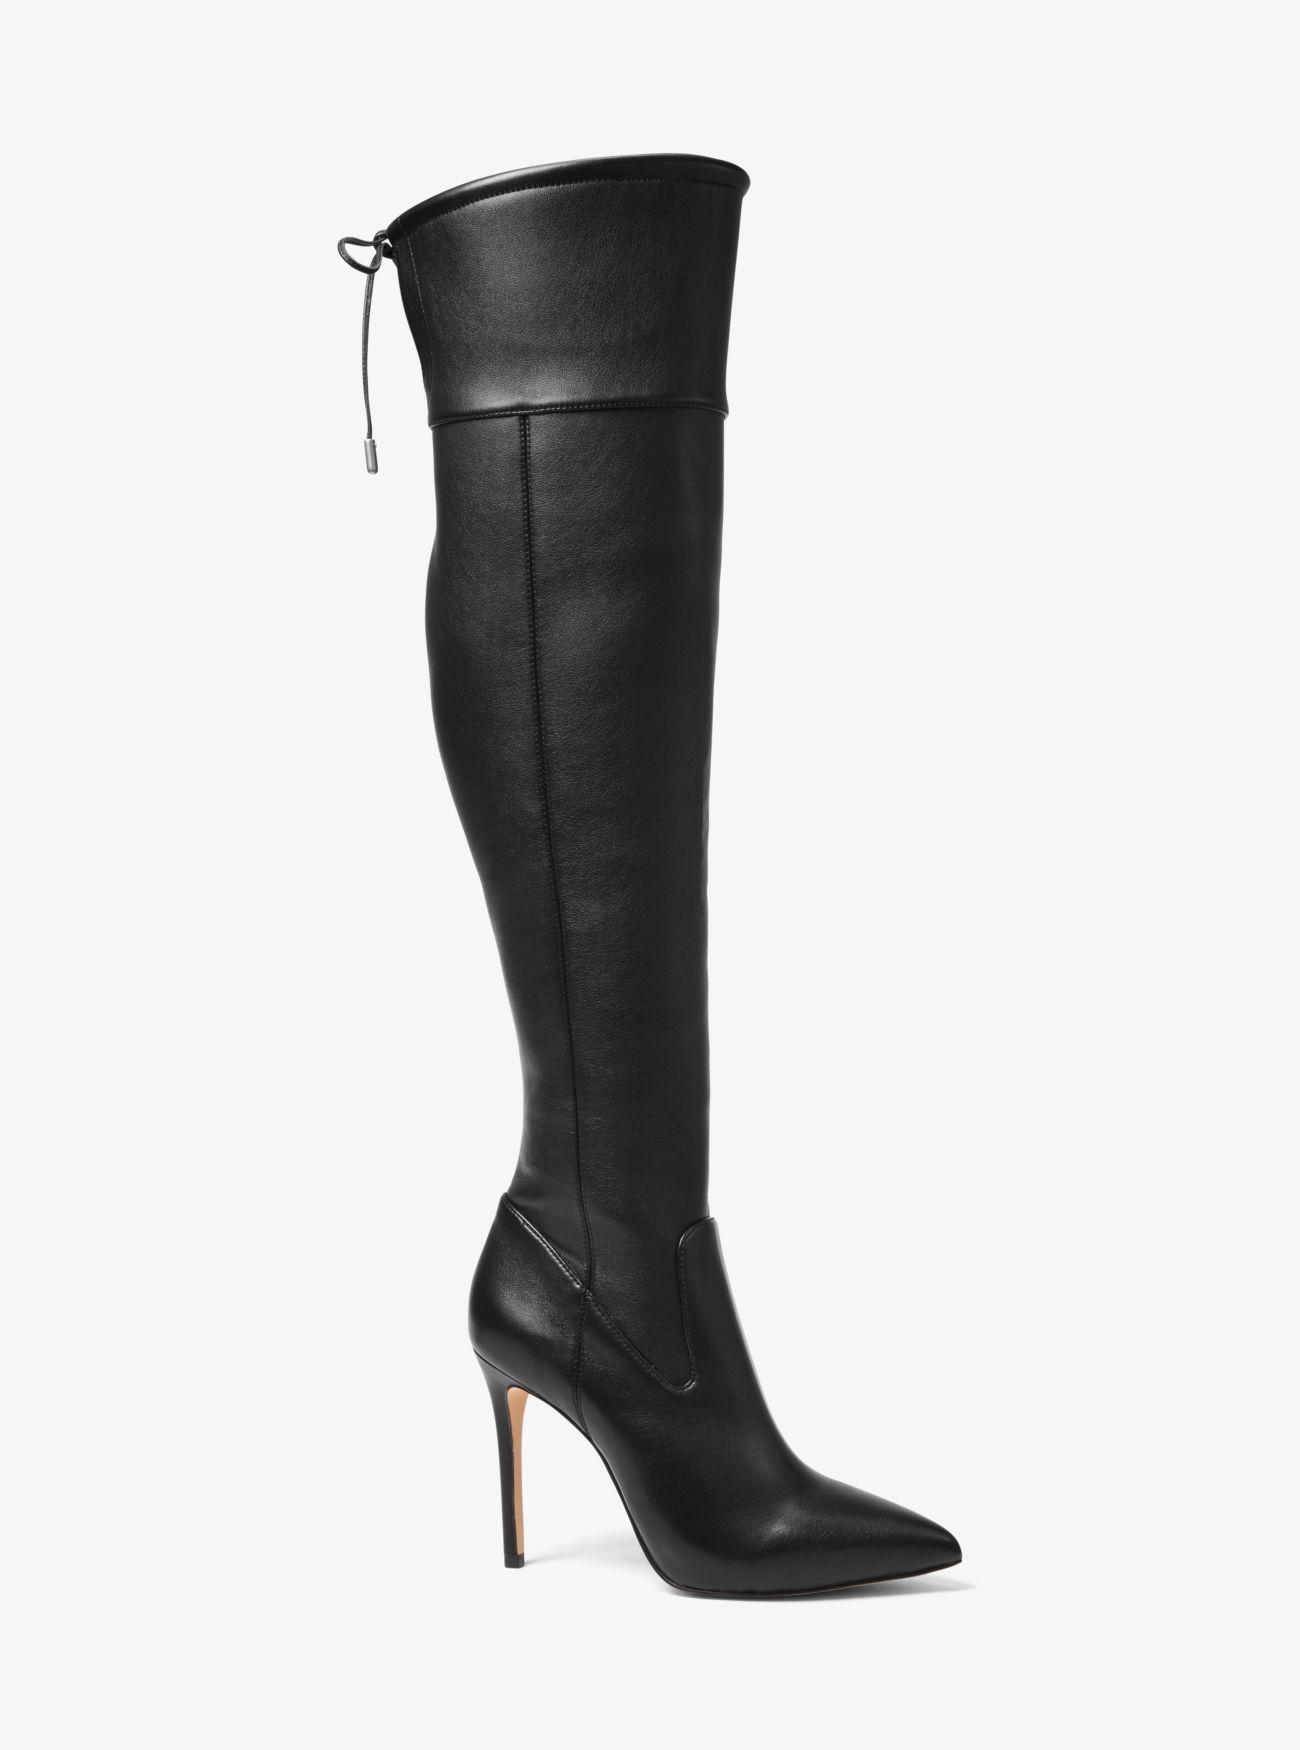 8dc19fd4163 Lyst - MICHAEL Michael Kors Jamie Stretch Over-the-knee Stiletto ...